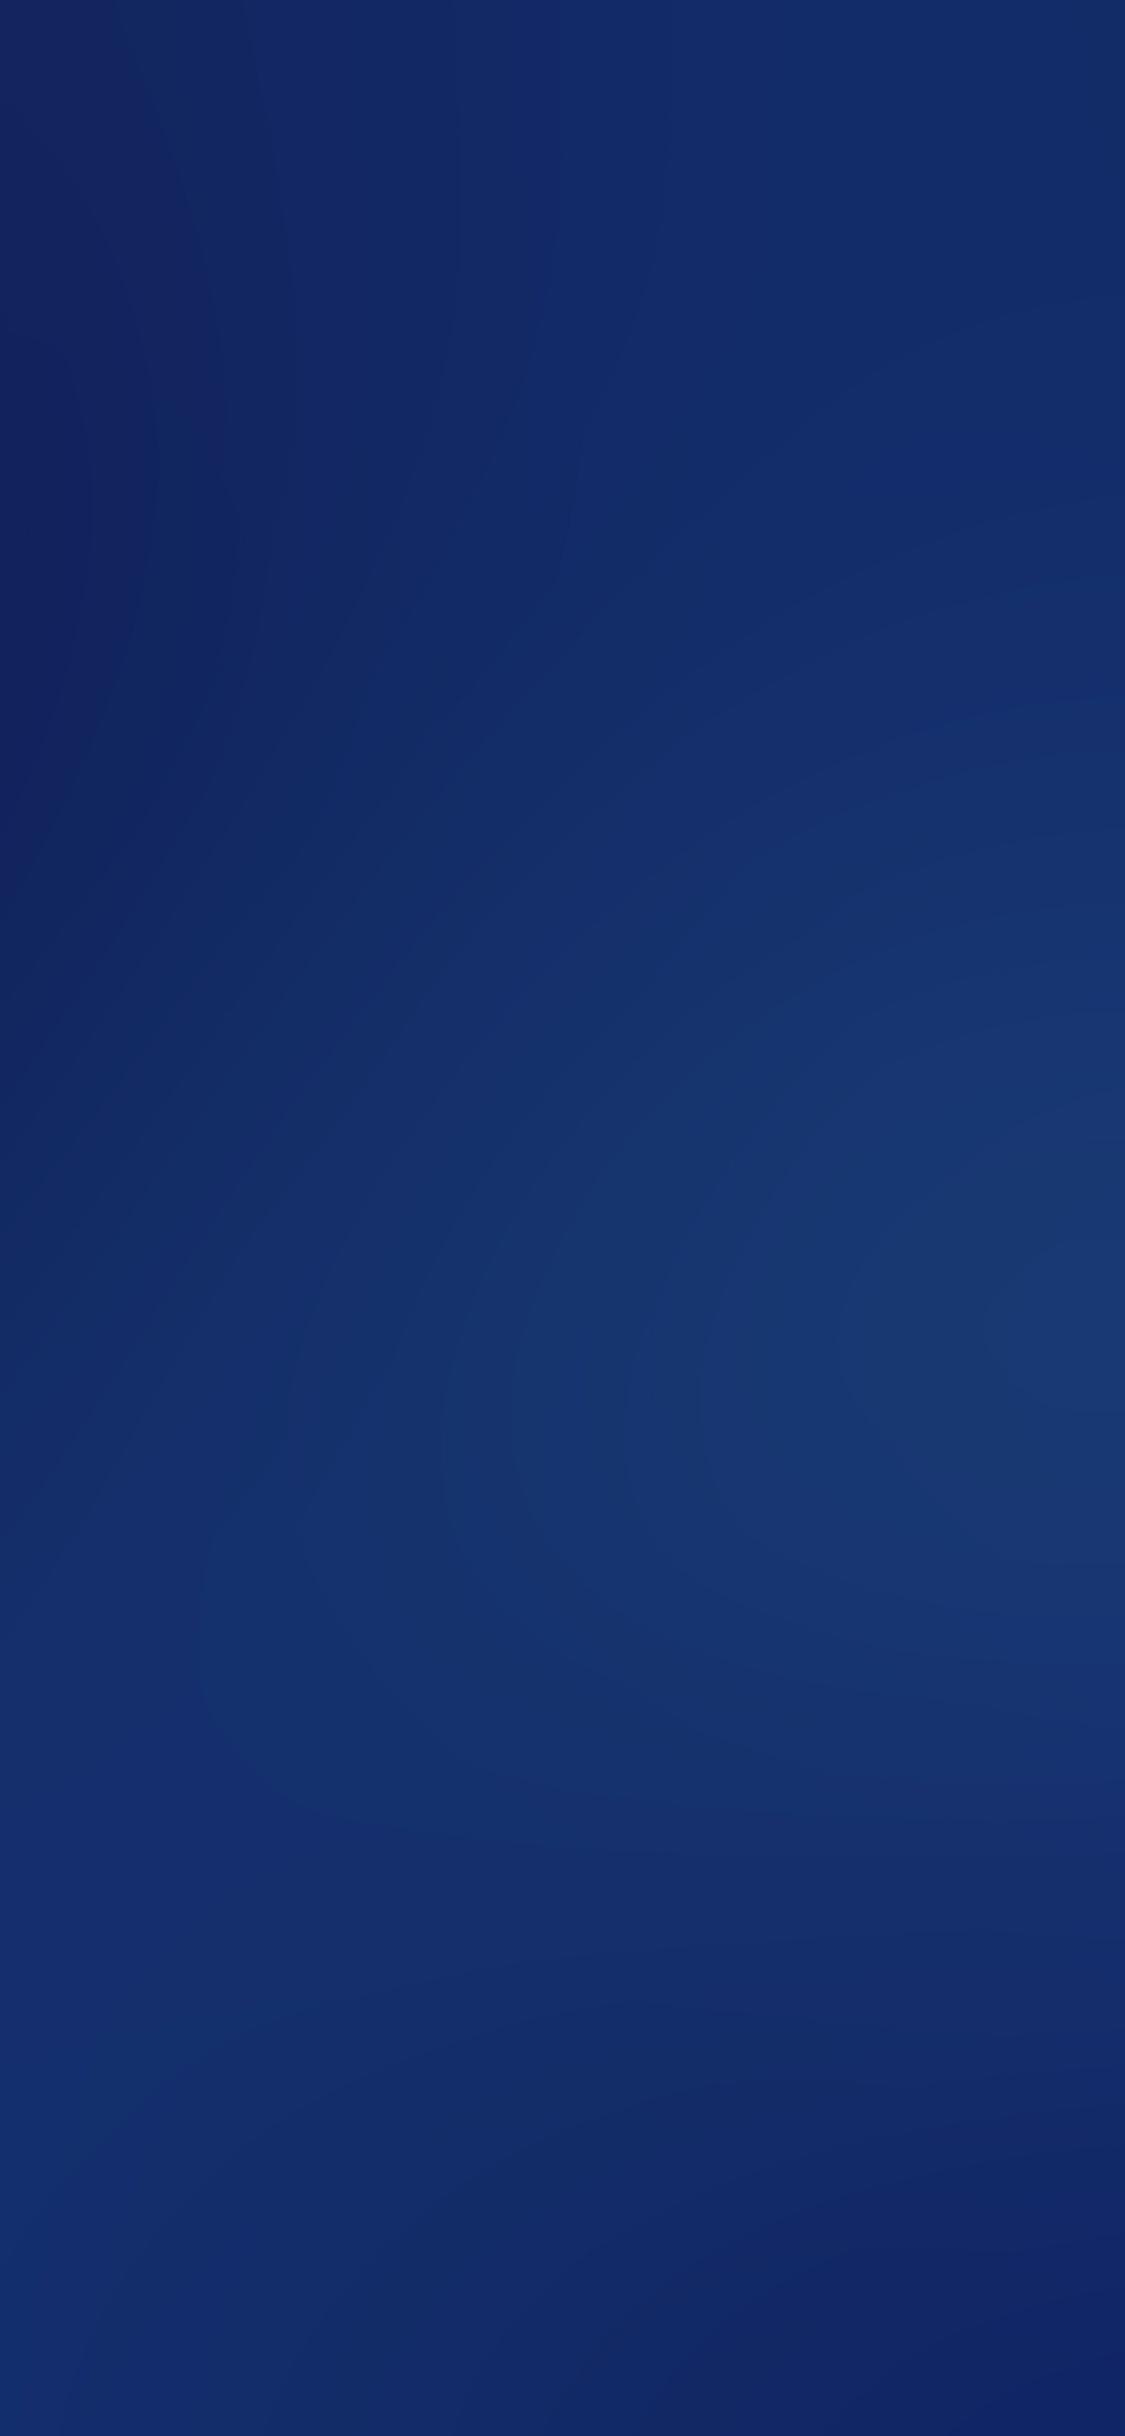 iPhoneXpapers.com-Apple-iPhone-wallpaper-se67-ocean-blue-gradation-blur